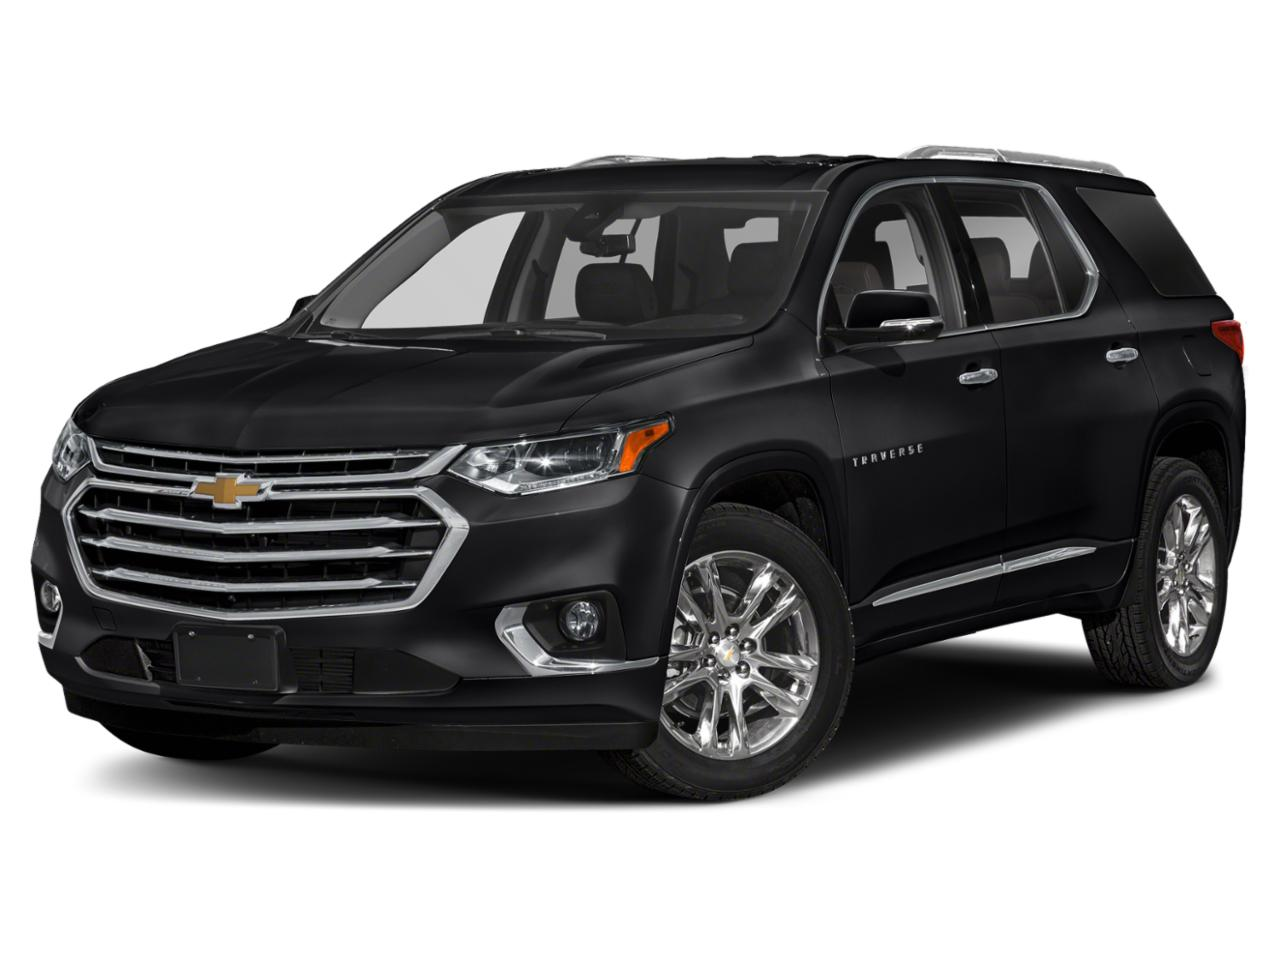 2021 Chevrolet Traverse Vehicle Photo in Washington, NJ 07882